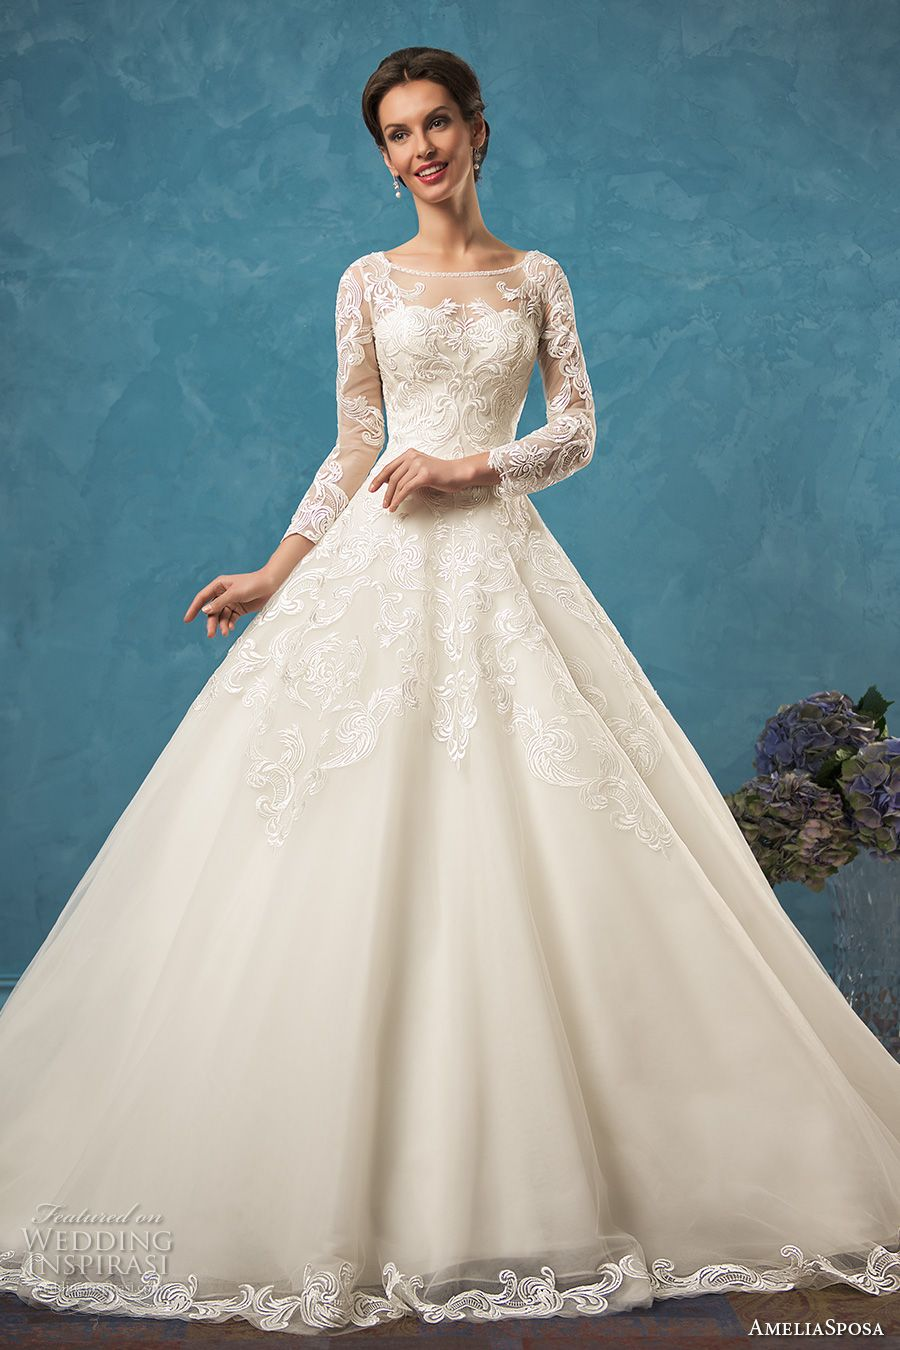 Amelia Sposa 2017 Wedding Dresses | Vestidos de novia, De novia y Novios